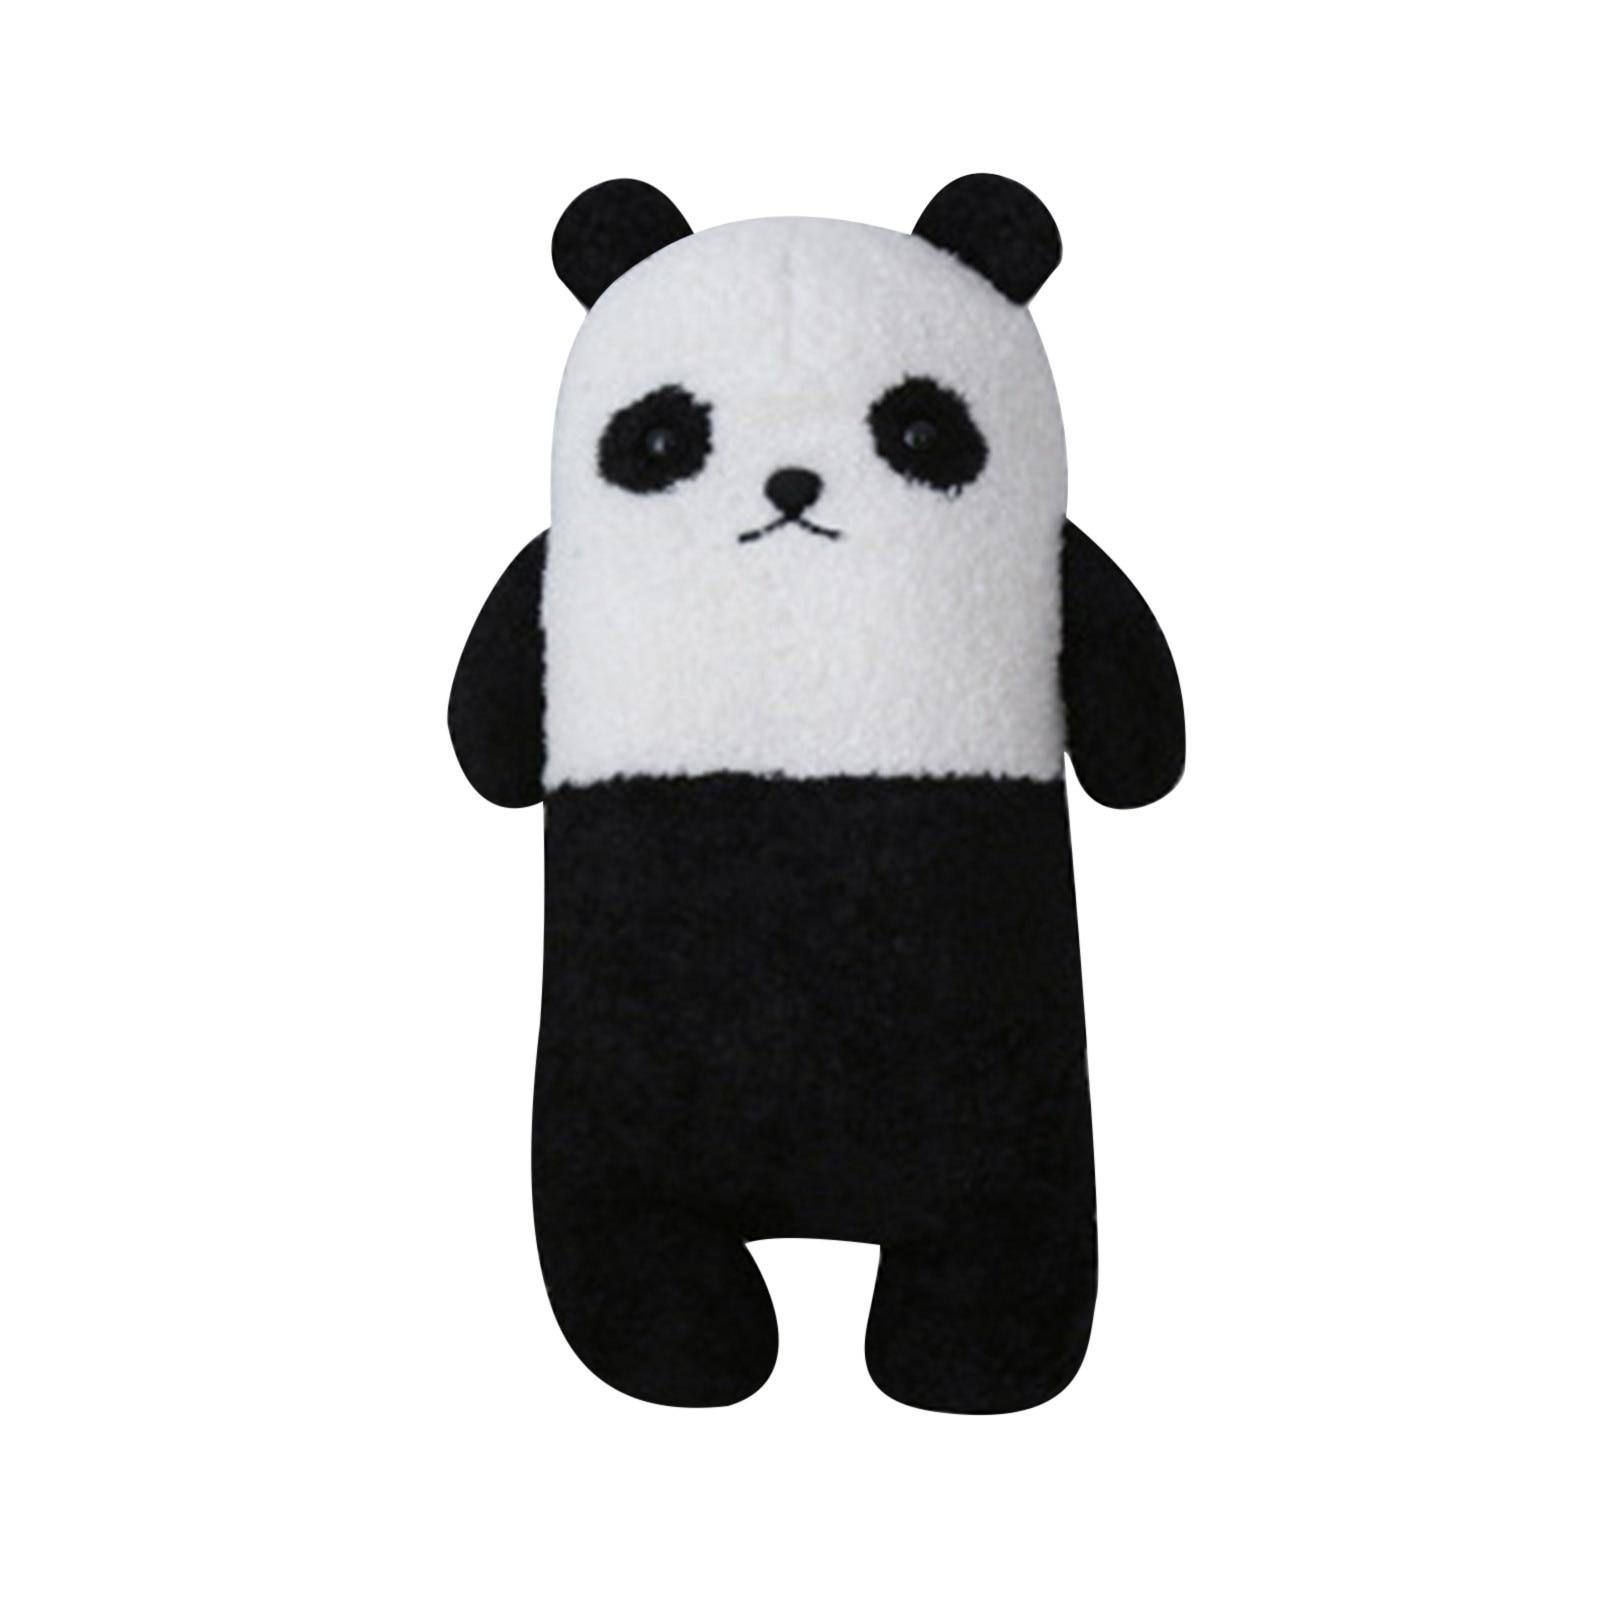 Squishmall Panda Plush Toys Children Stuffed Animals Cartoon Figure Plush Doll Pillow Soft Cute Plush Stuff Birthday Gift Kids